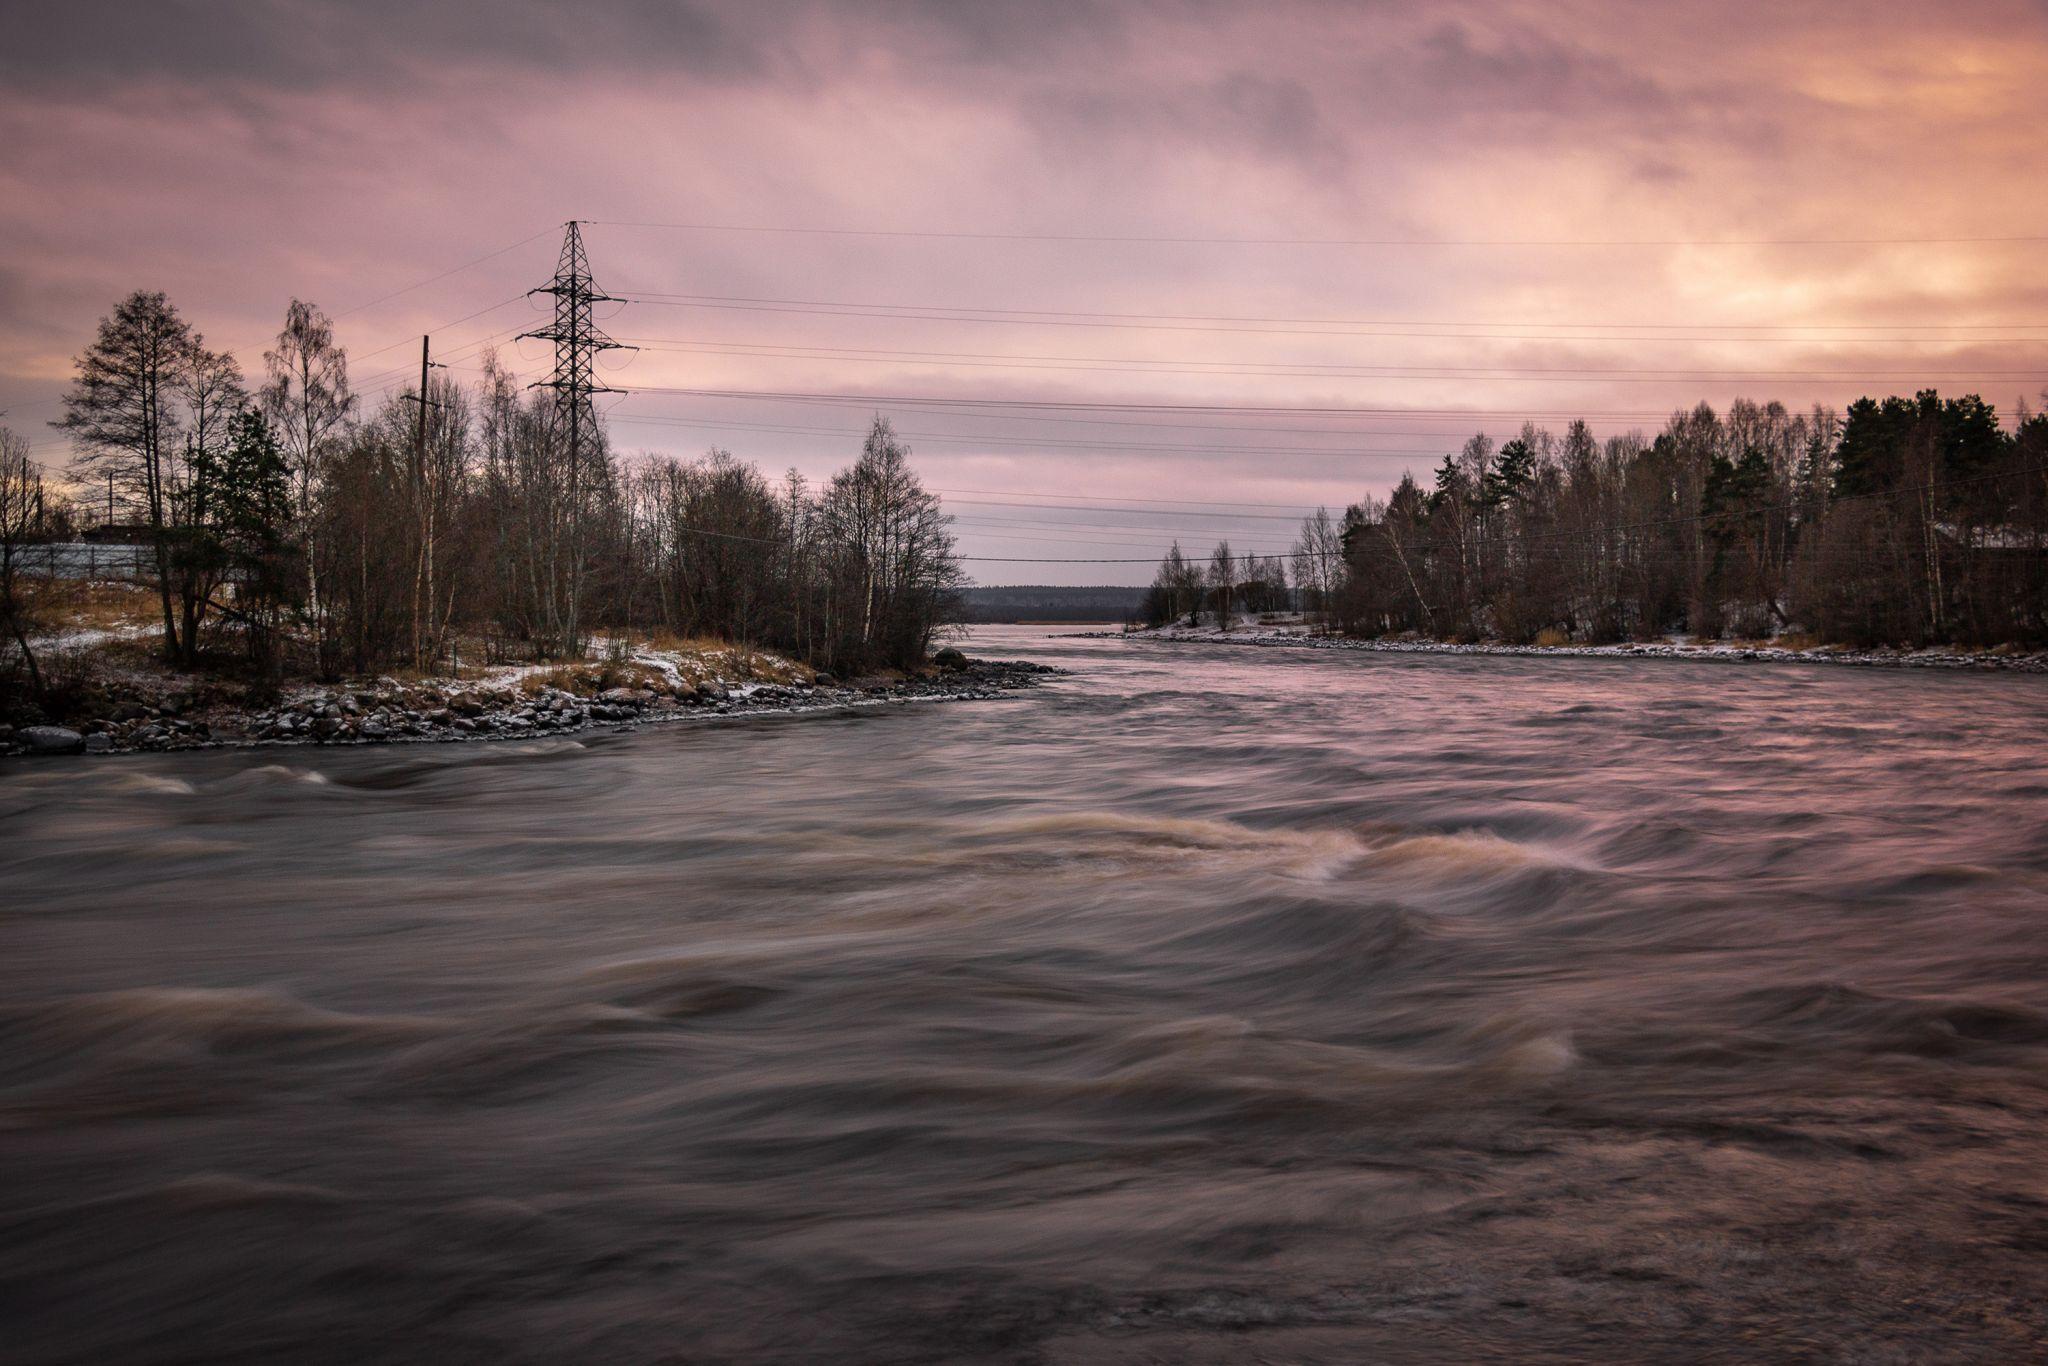 Thresholds on the Vuoksa River, Leningrad Region, Russian Federation